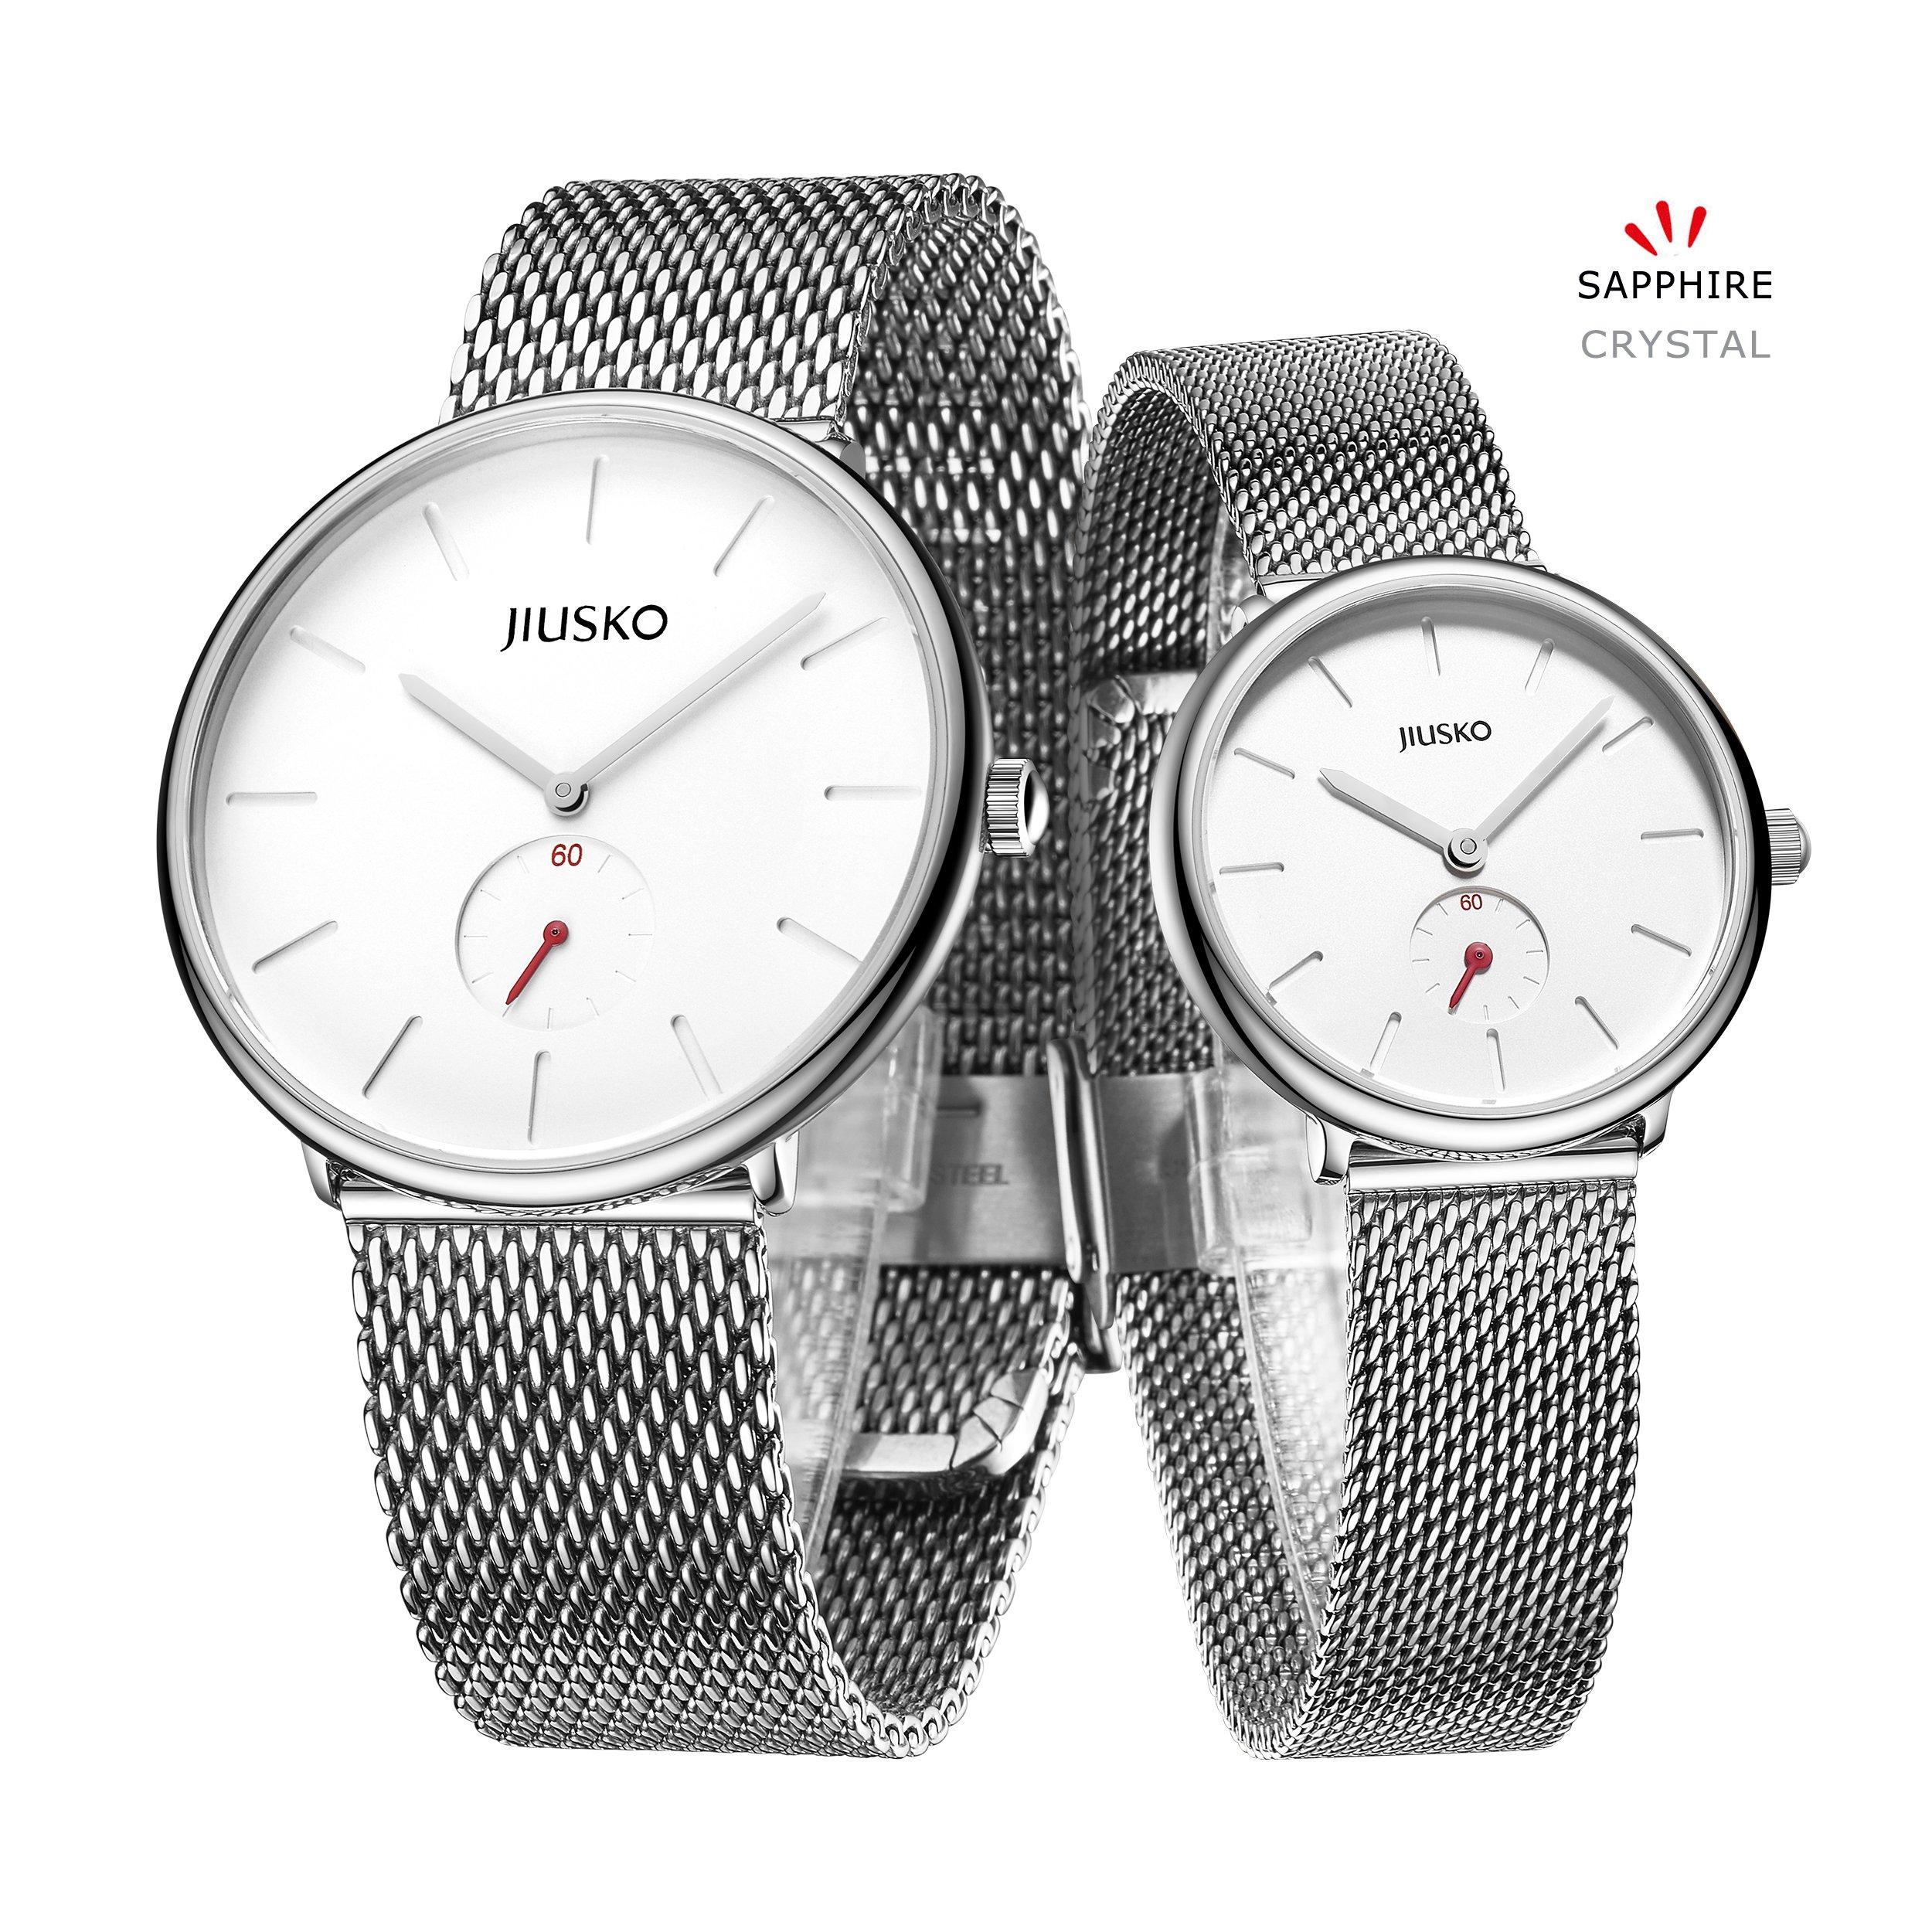 Jiusko Sapphire - His Her Slim Quartz Wrist Watch - Steel Mesh - 393 (Couple - Silver)